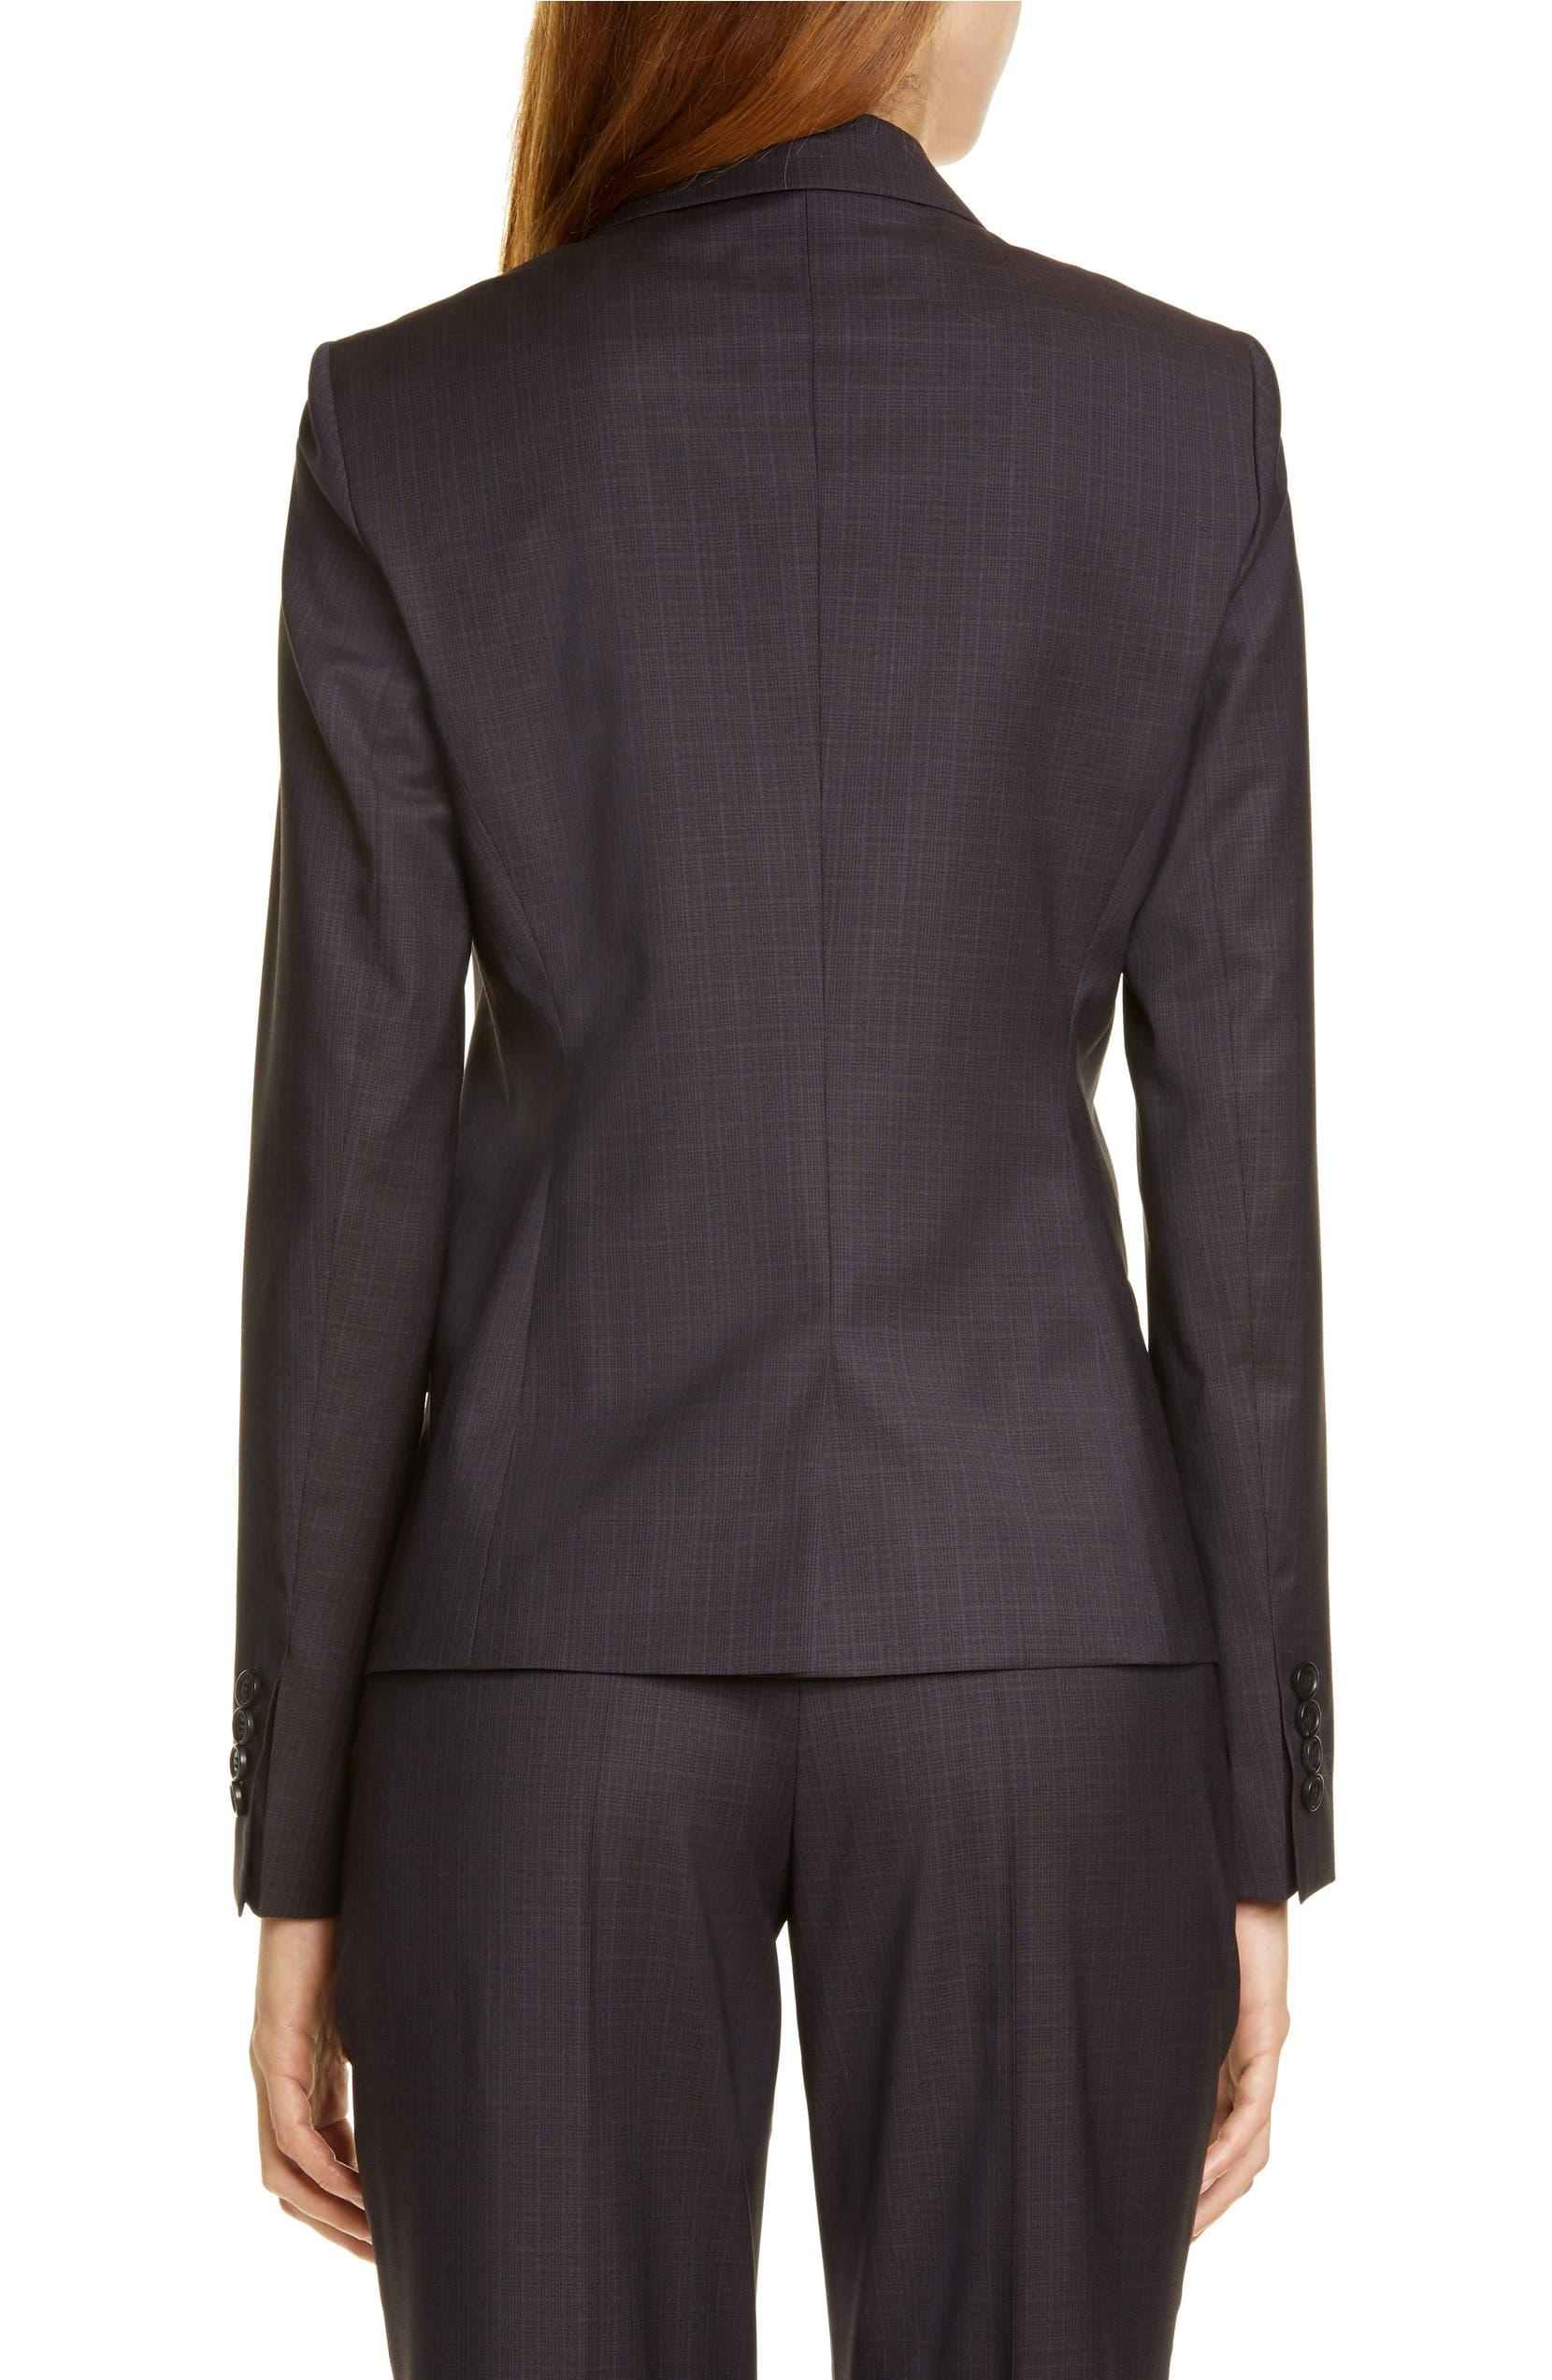 9c7547c99 BOSS Jarana Rich Check Wool Suit Jacket (Regular & Petite)   Nordstrom